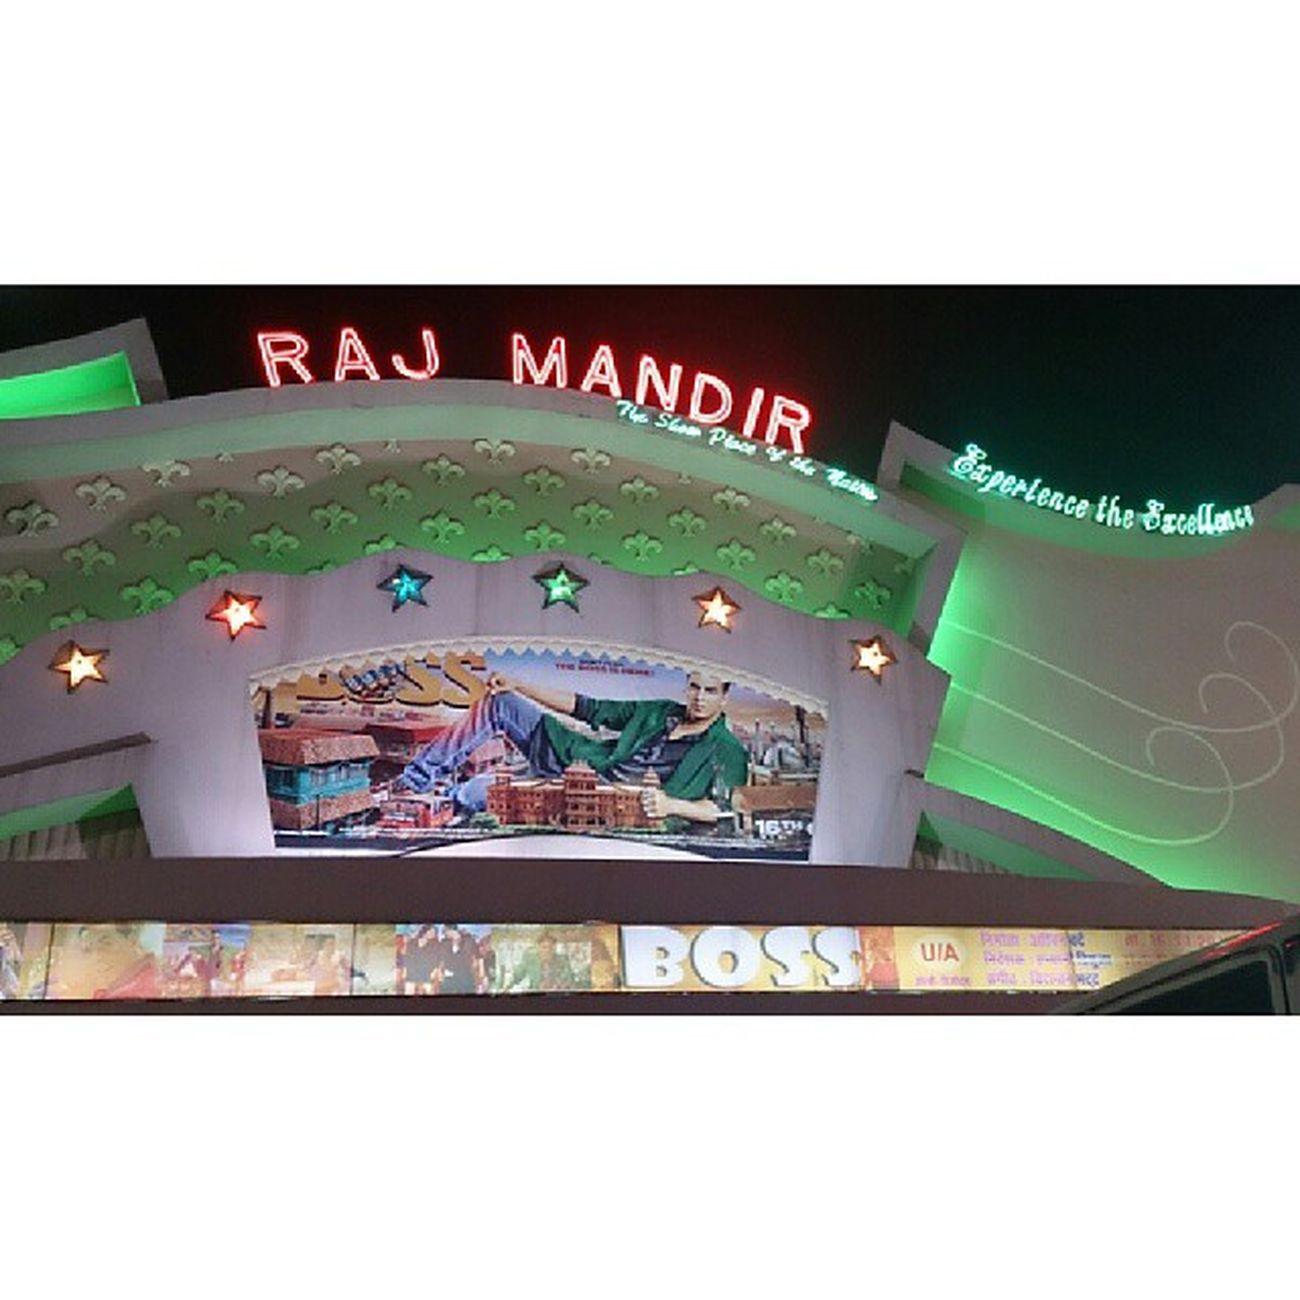 Jaipur RajMandir Boss MOVIE Hit Awesome AkshayKumar Holiday Asias Largest MOVIE Hall Evening Fun Love